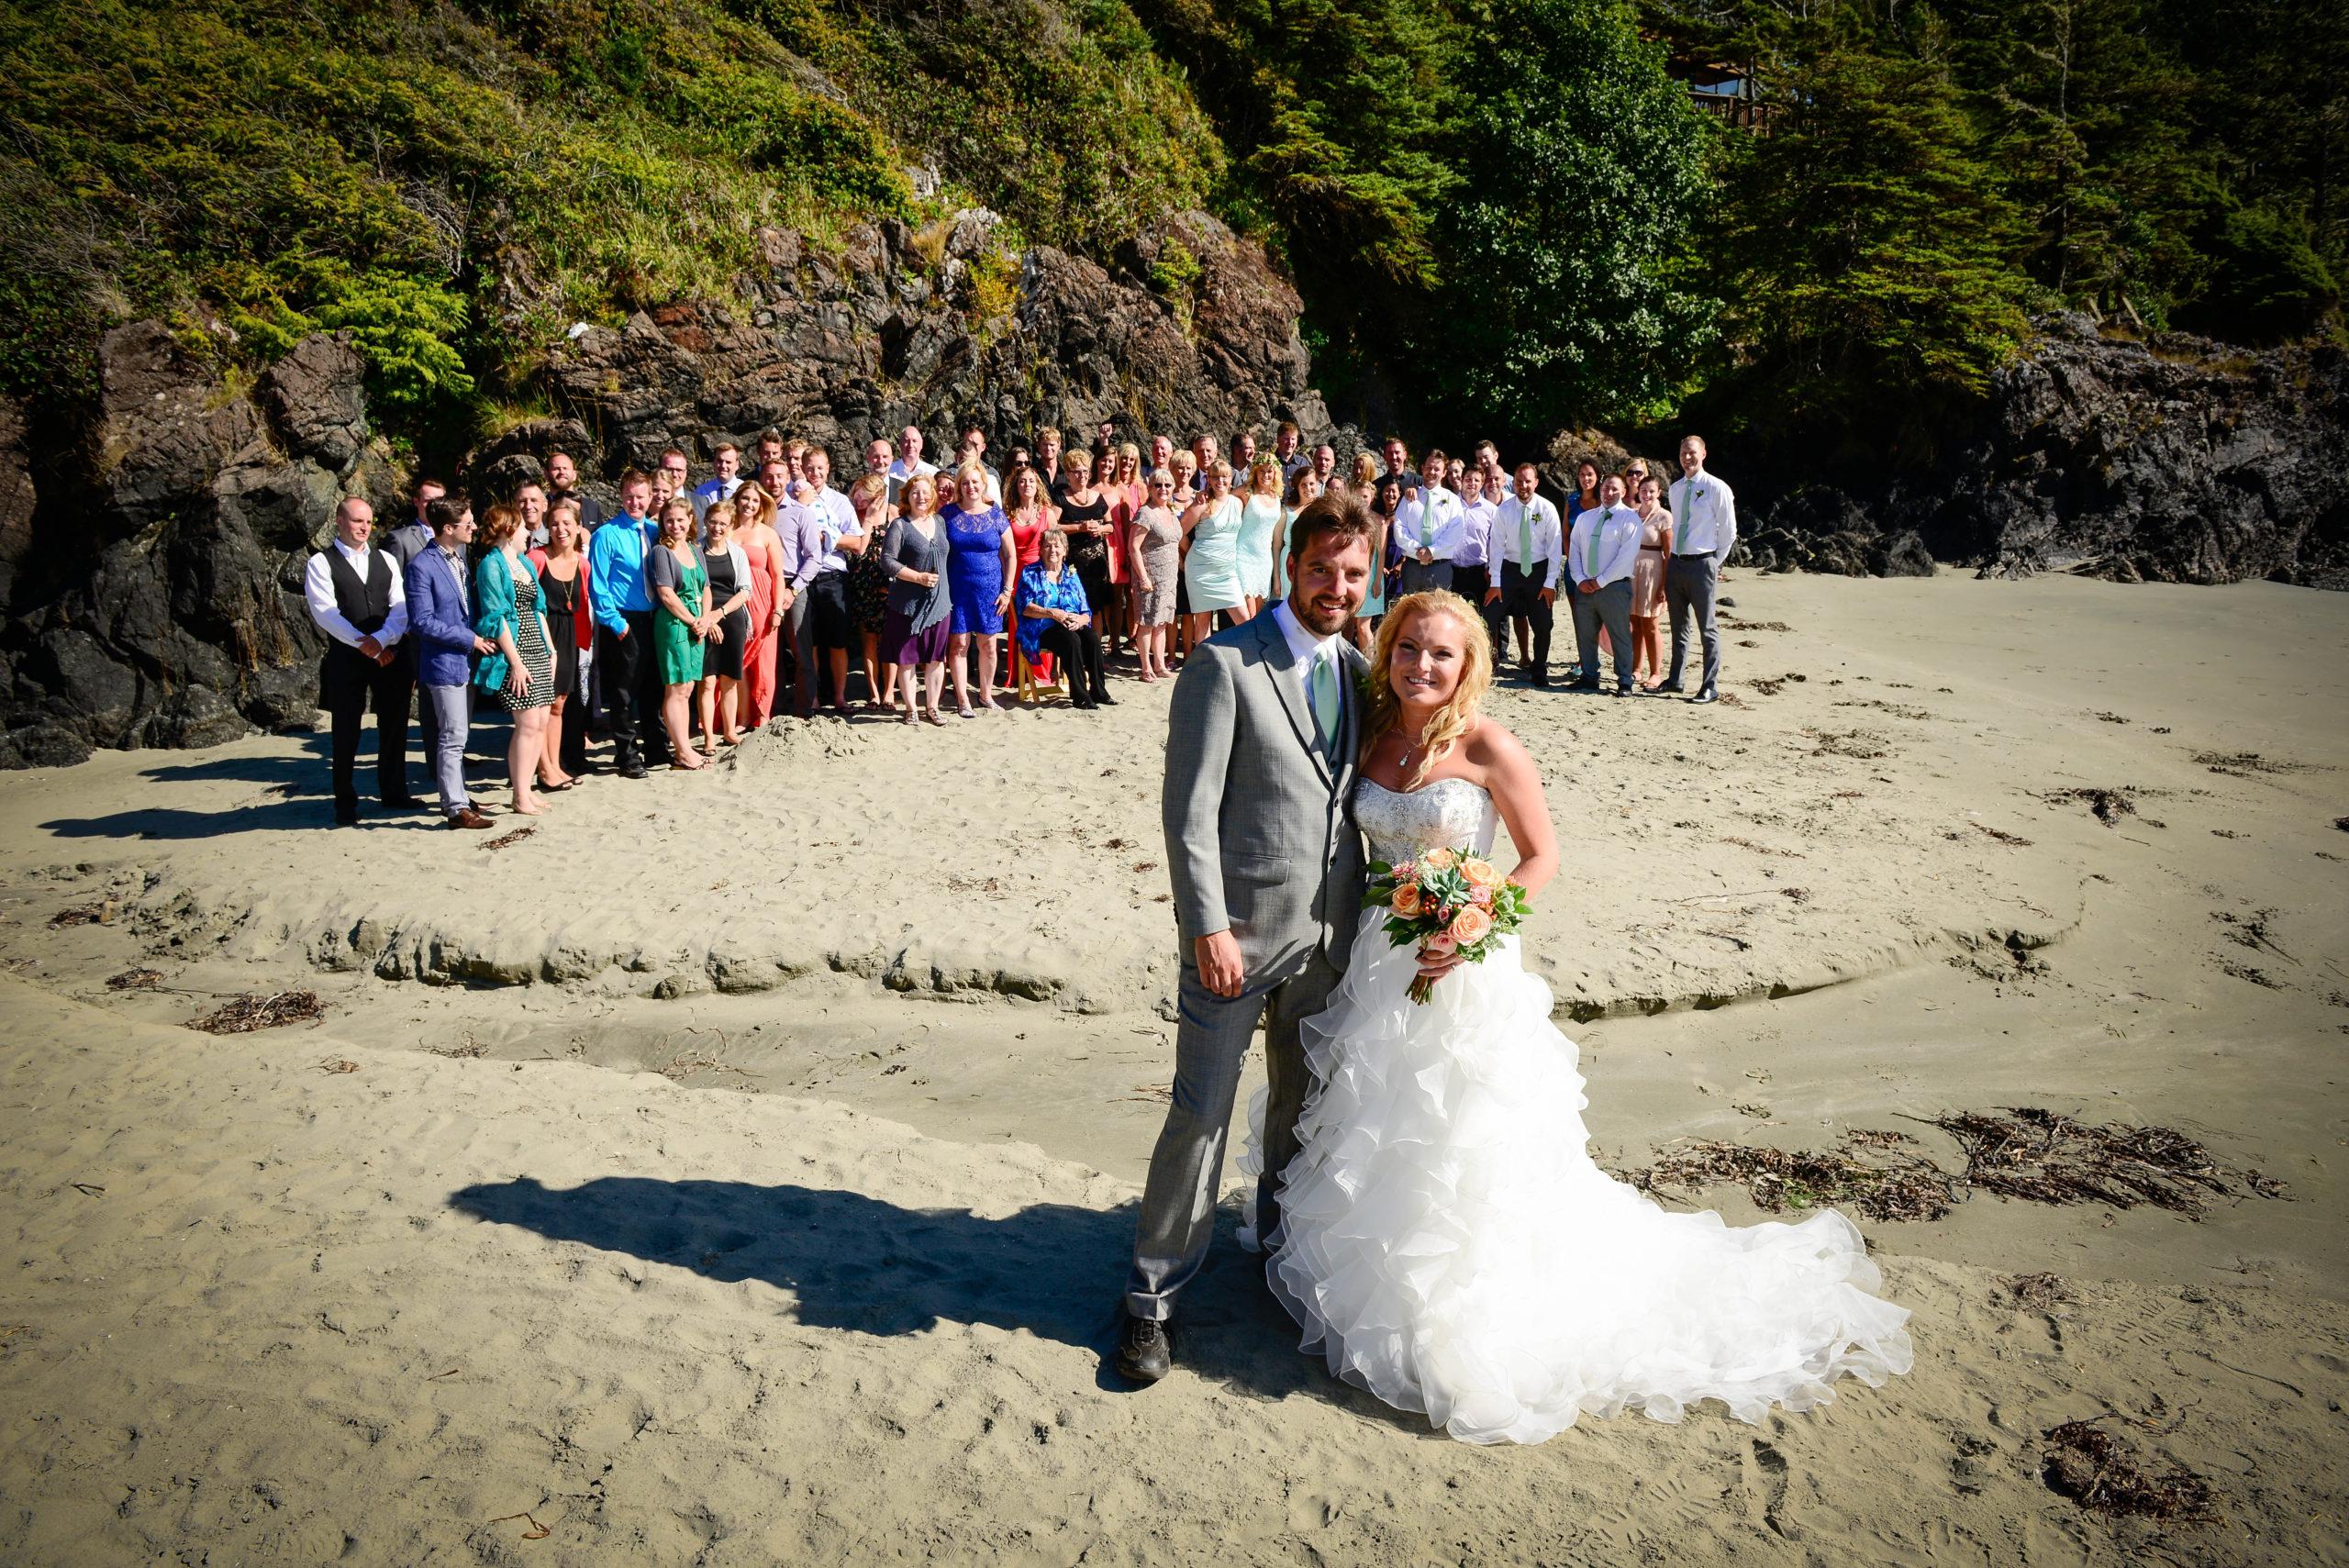 Douglas Ludwig_Beach Wedding Party